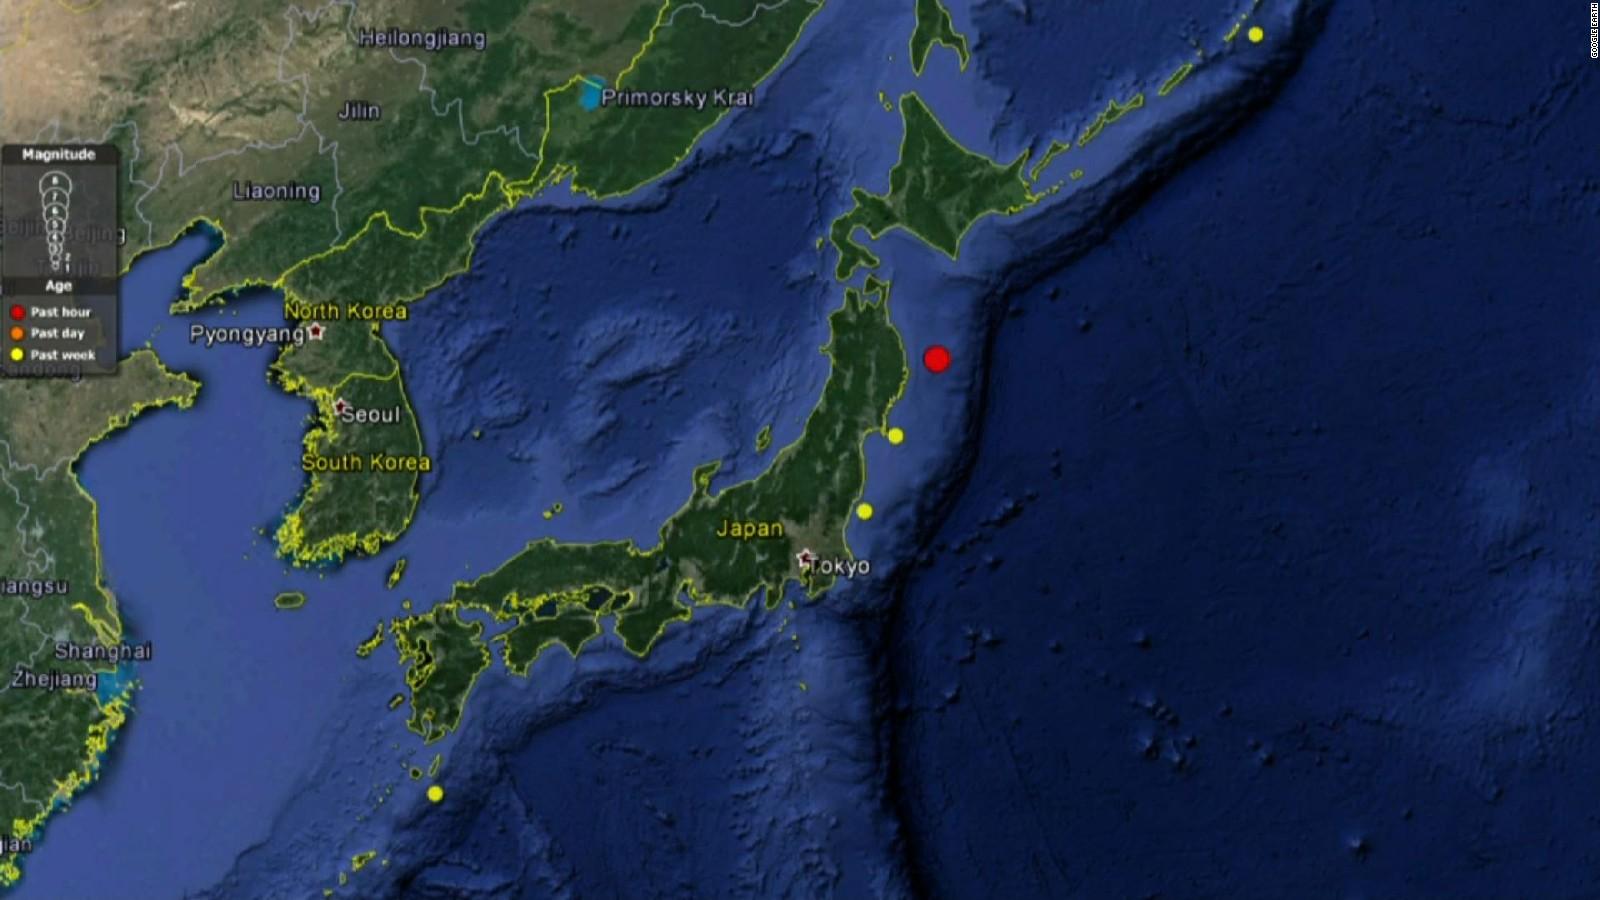 Aerial Map Of Japan.6 7 Earthquake Hits Off Japanese Coast Cnn